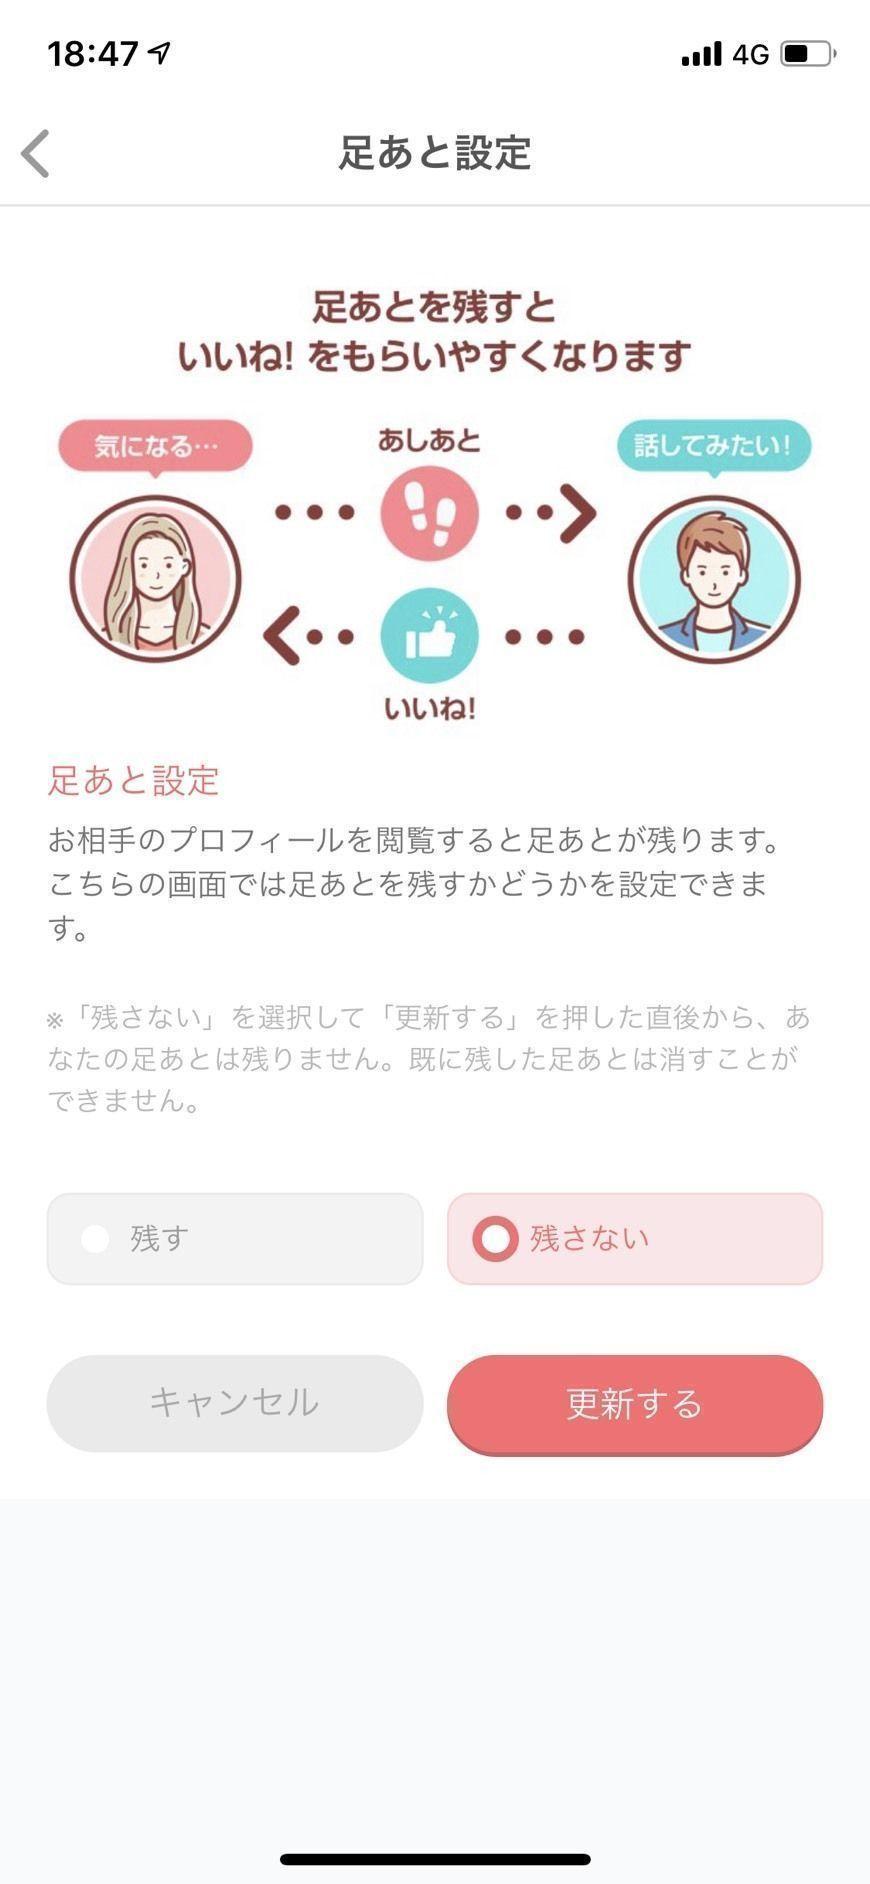 with マッチング後の足跡は残る?